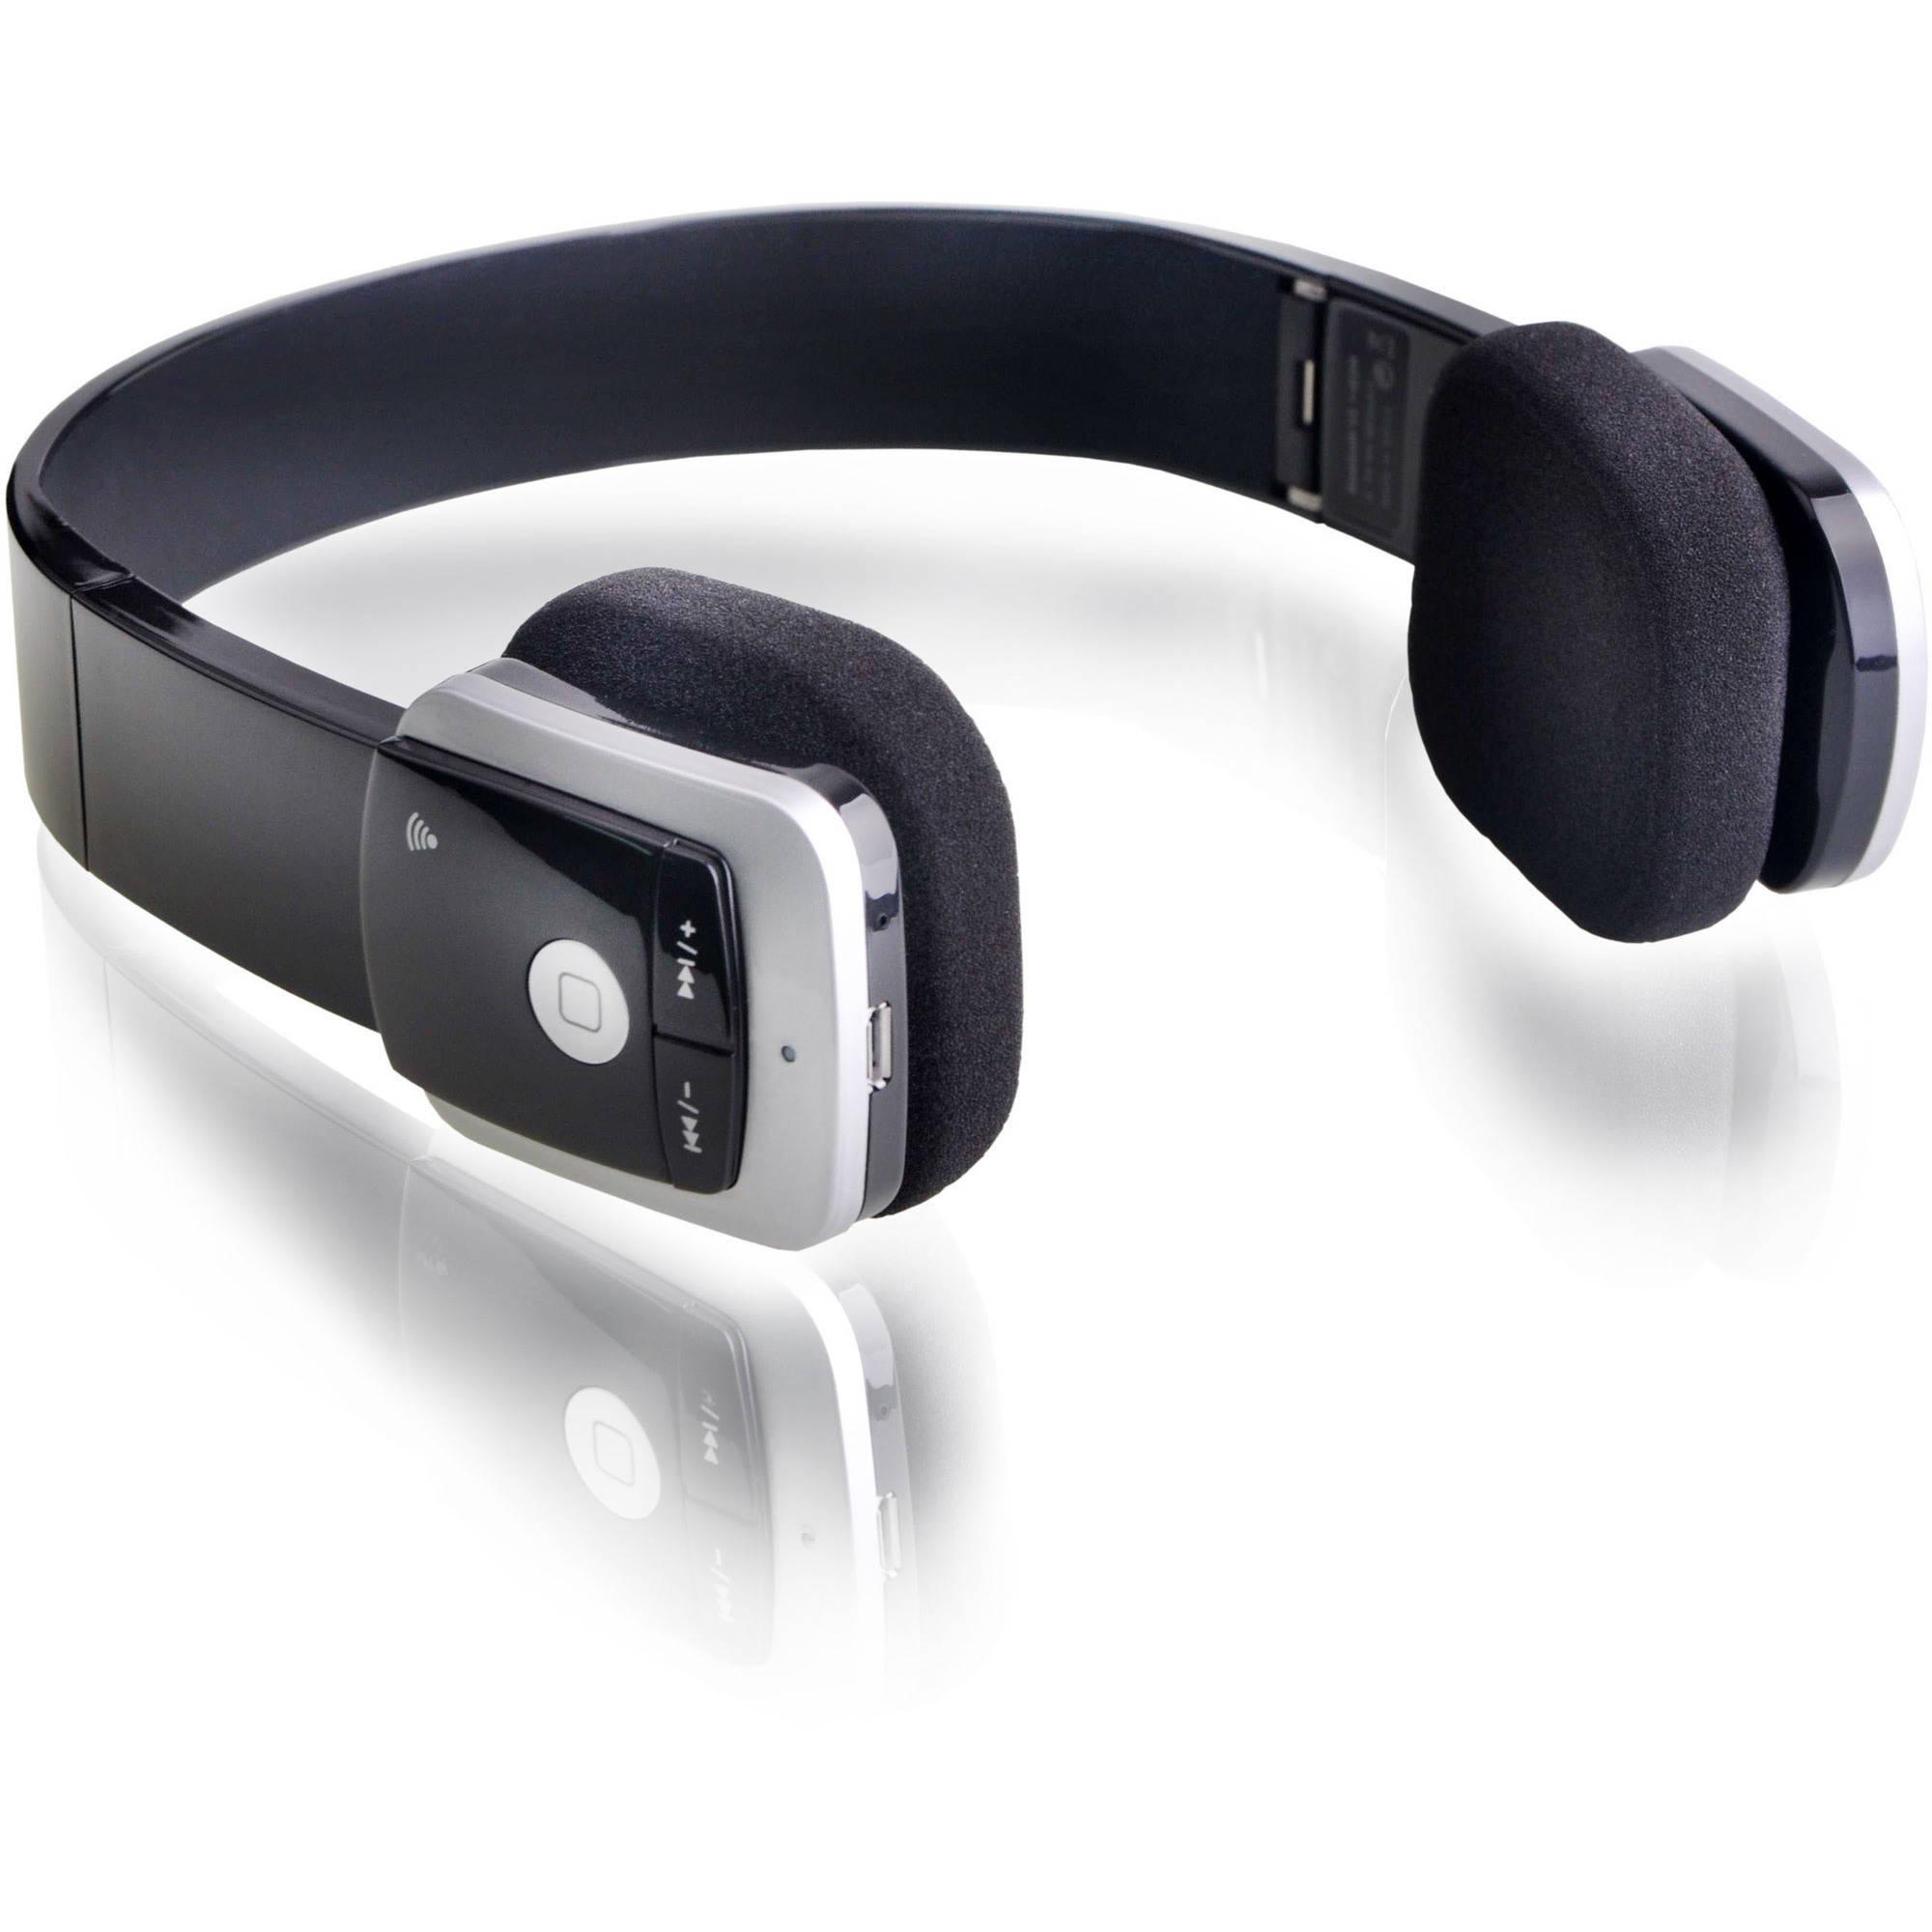 Azeca NFC Bluetooth Headphones